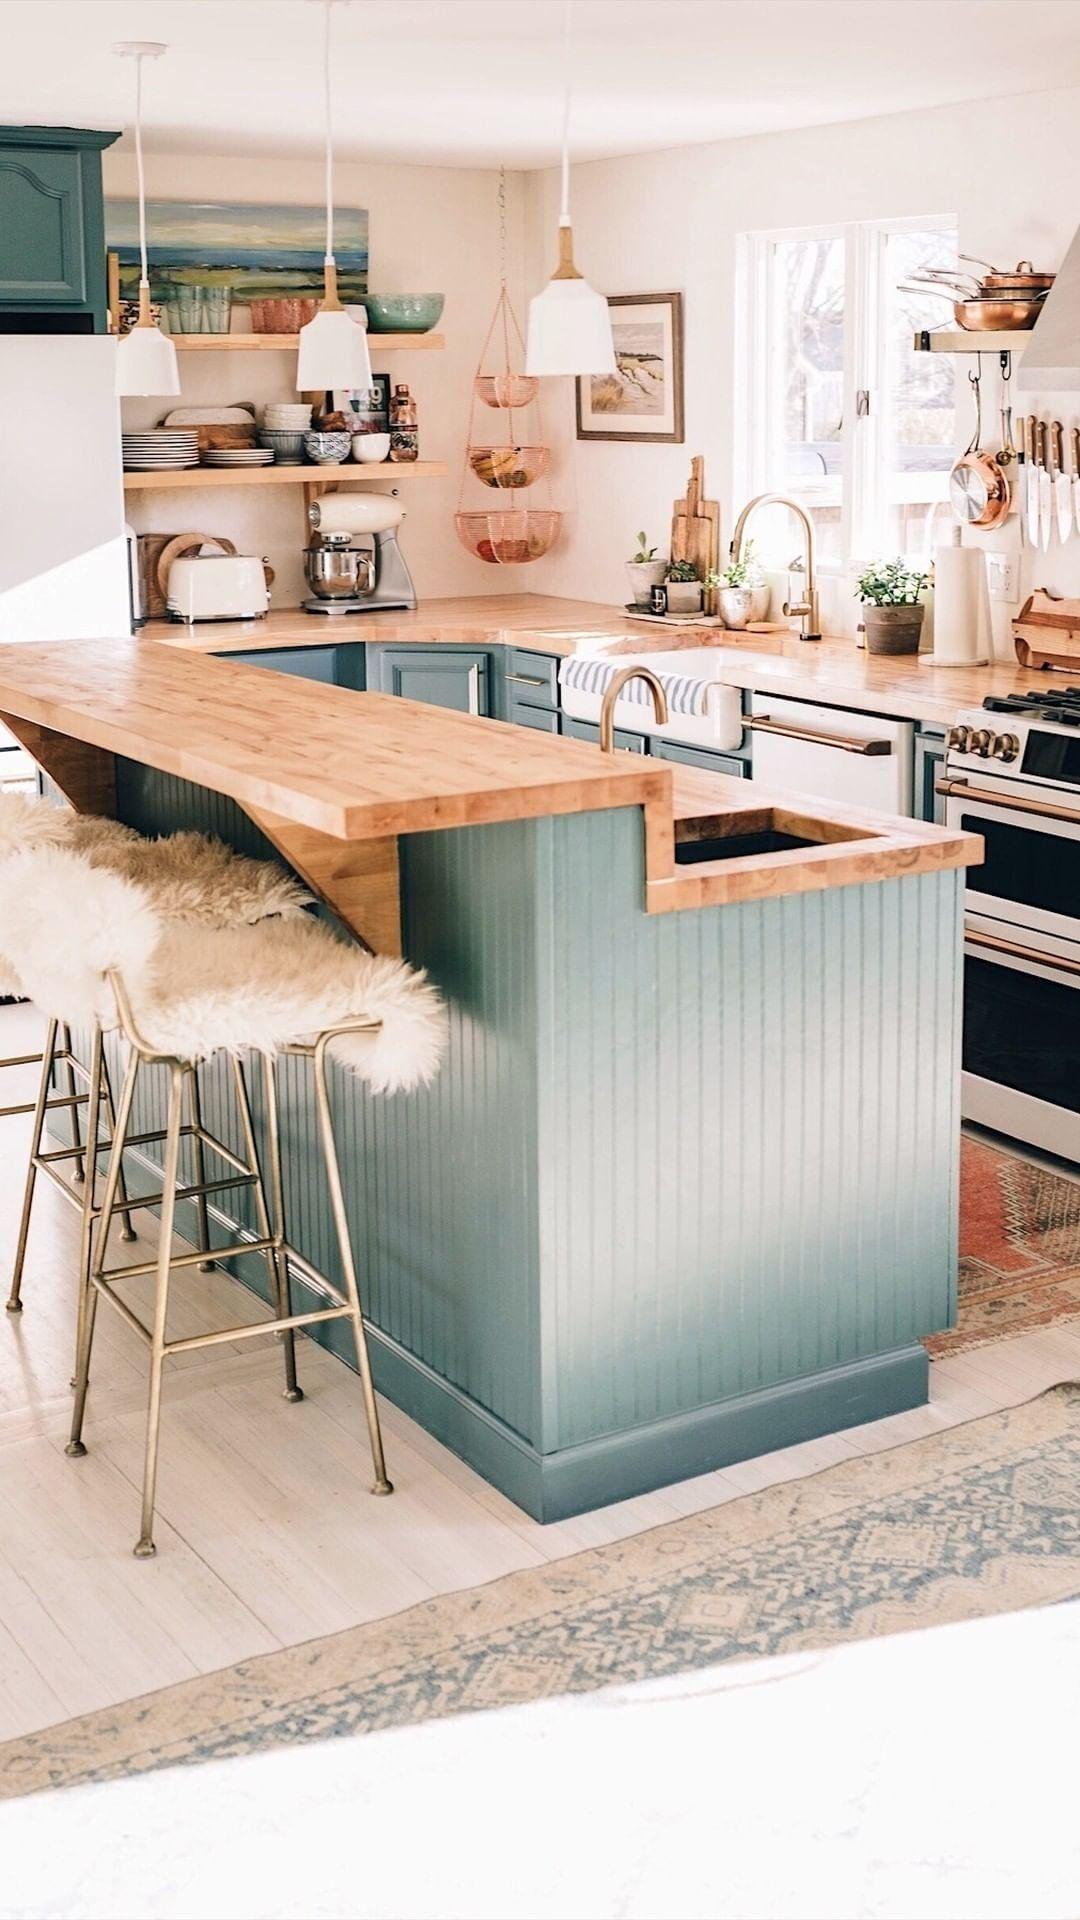 Kitchen Update: Our New Café Appliances | Jess Ann Kirby